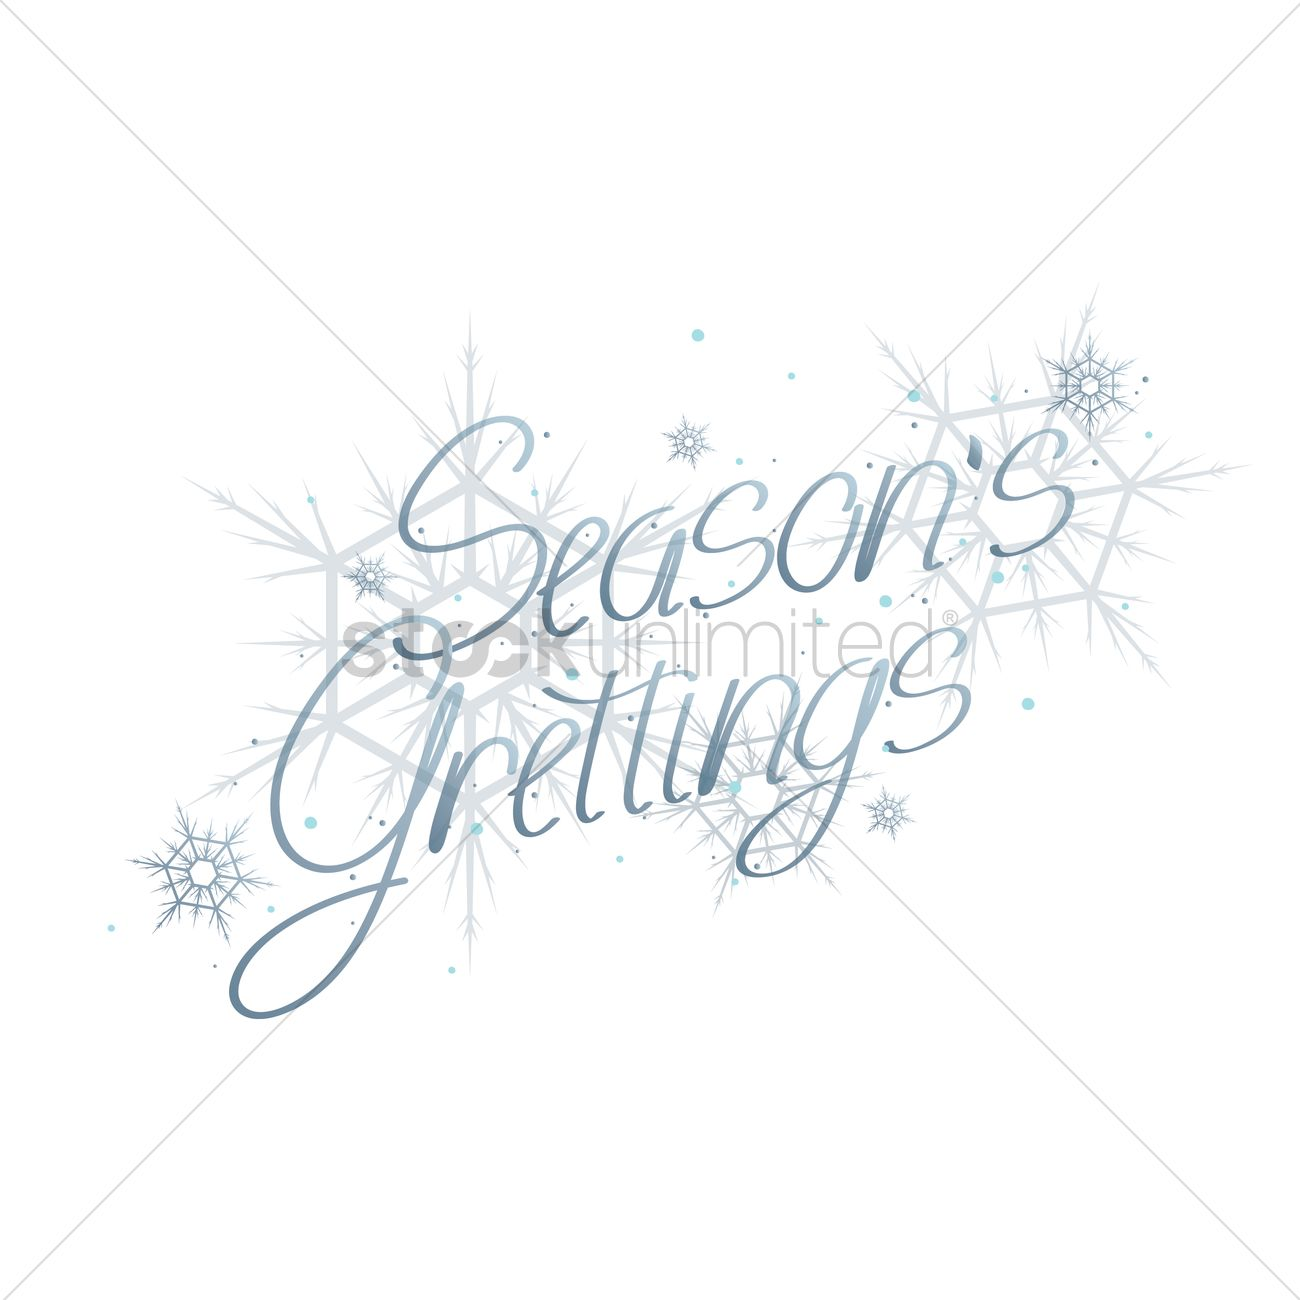 Seasons greetings vector image 1603640 stockunlimited seasons greetings vector graphic kristyandbryce Gallery